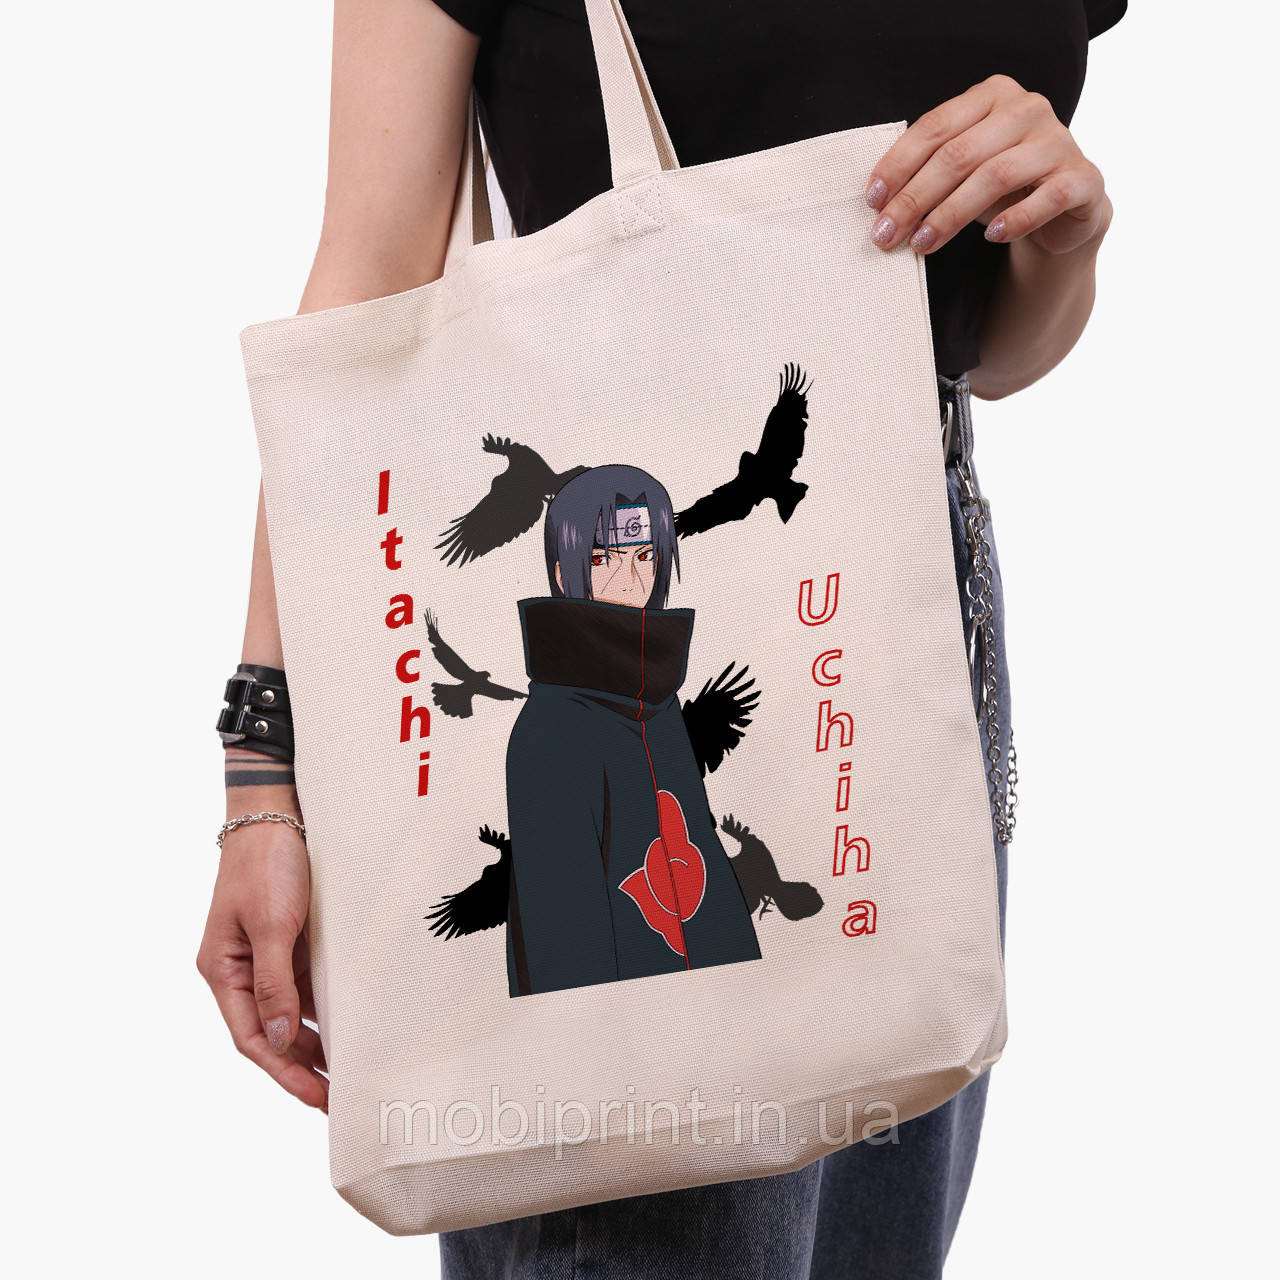 Эко сумка шоппер белая Итачи Учиха (Itachi Uchiha) (9227-2821-1)  41*39*8 см